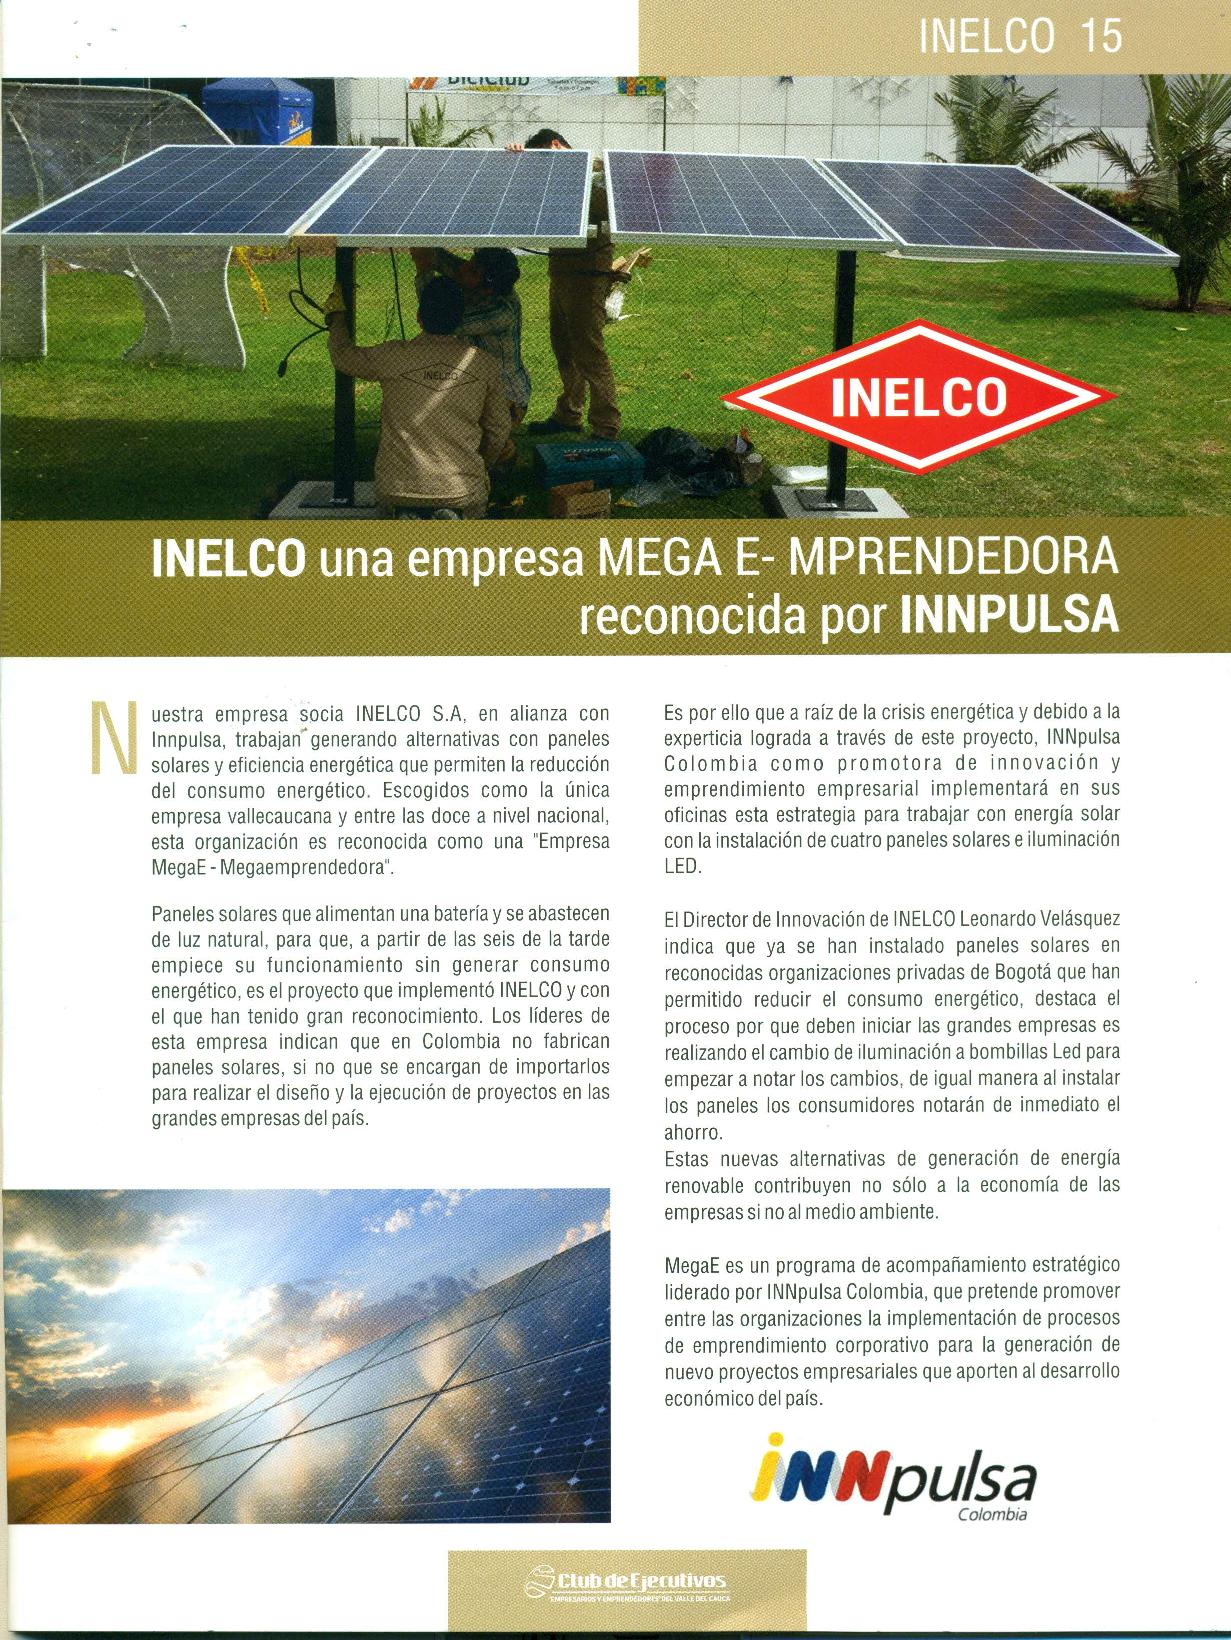 INELCO una empresa MEGA E-mprendedora-page-001